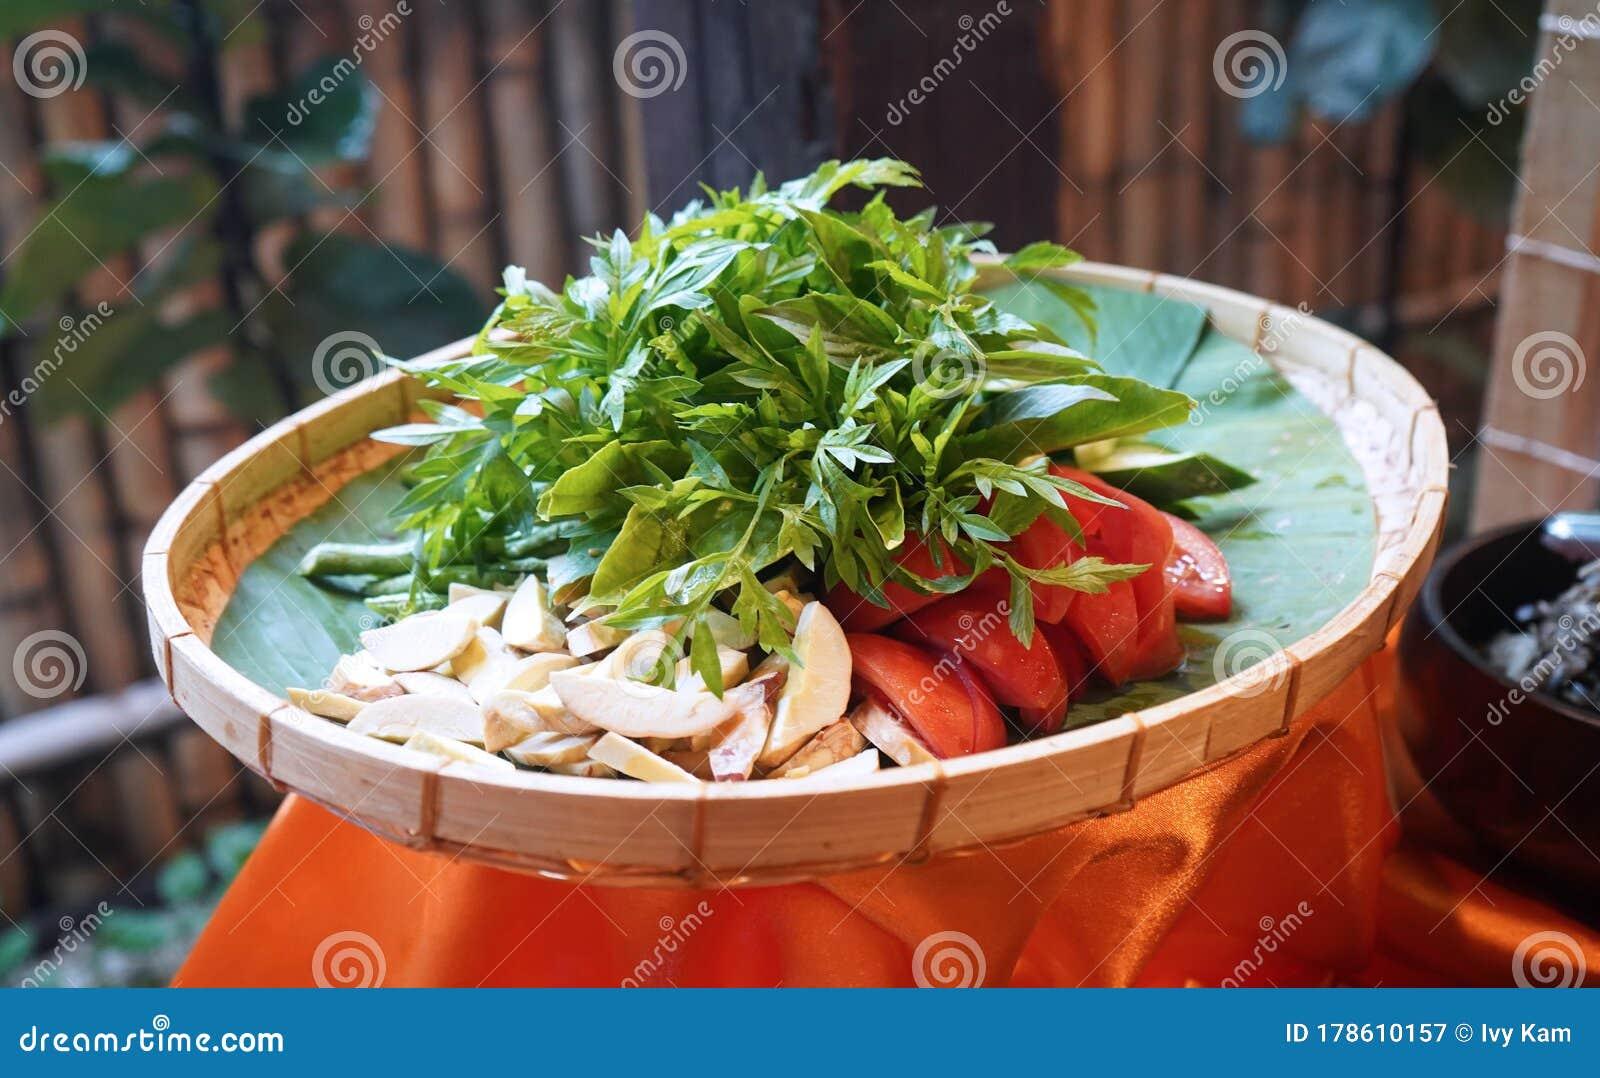 Raw Healthy Vegetables Platter Ulam Ulaman Stock Image Image Of Appetizer Ramadan 178610157